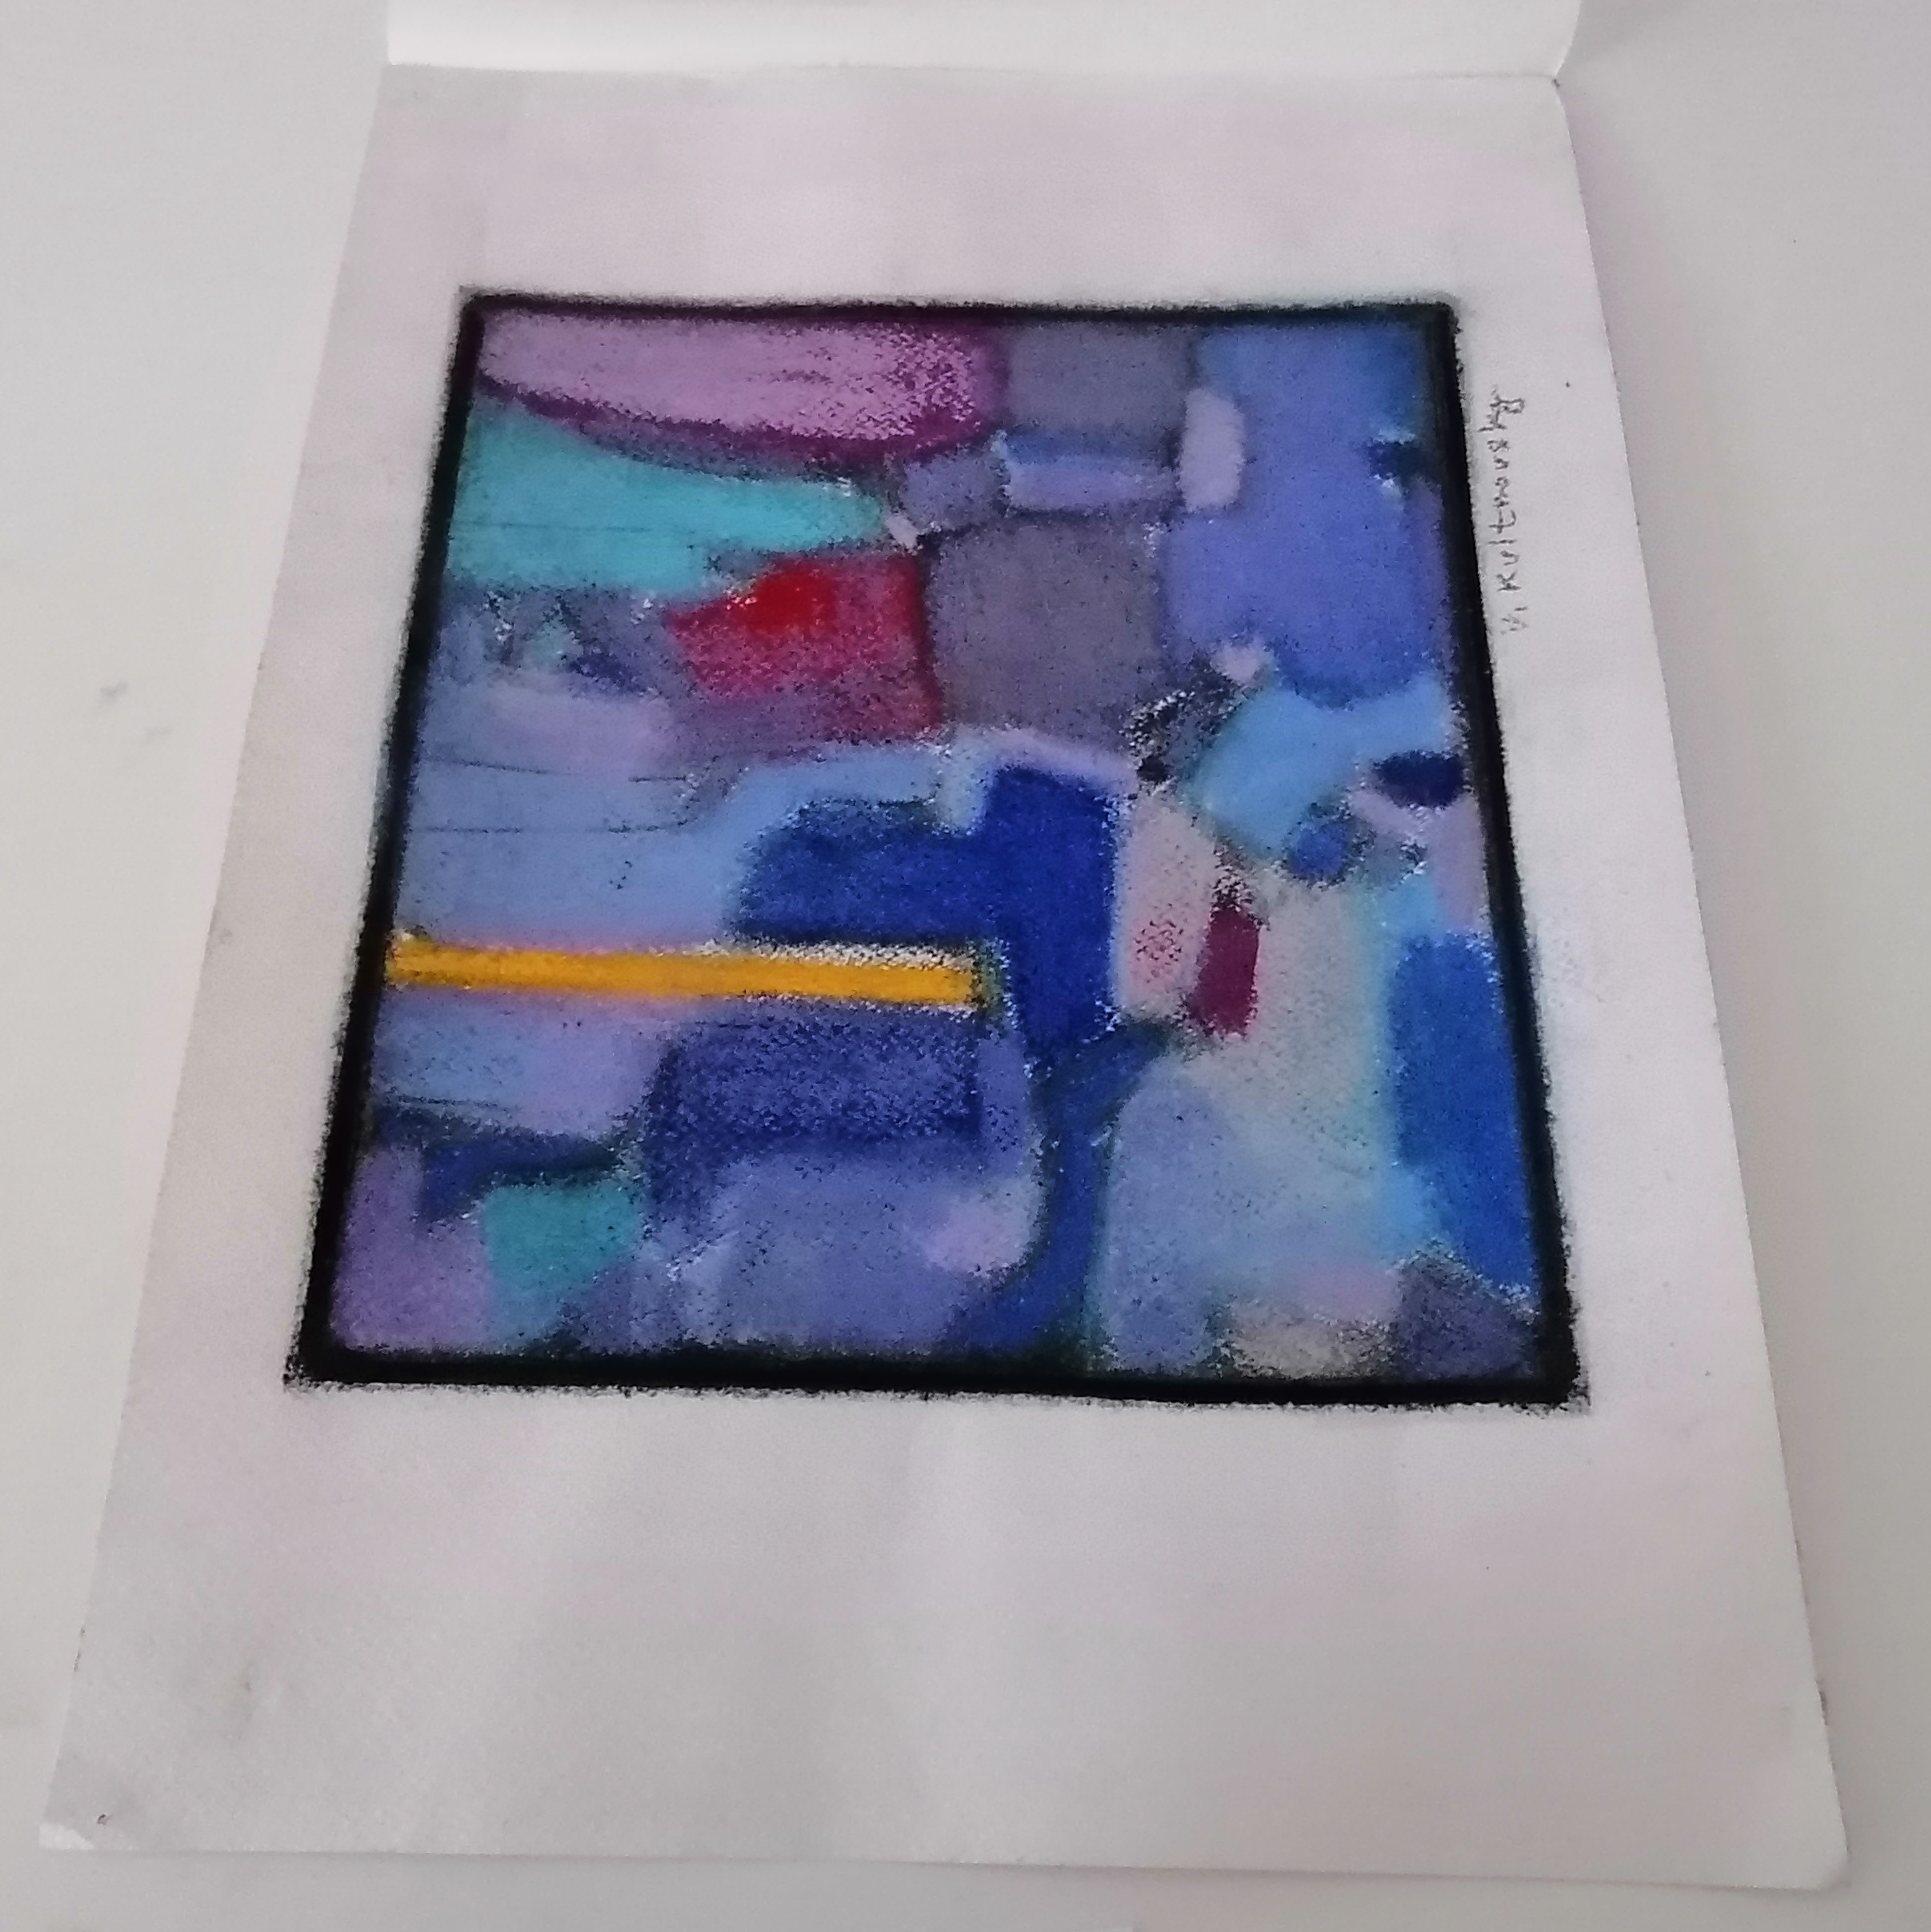 https://www.norstamps.com/content/images/stamps/gtgallerier/171.jpg